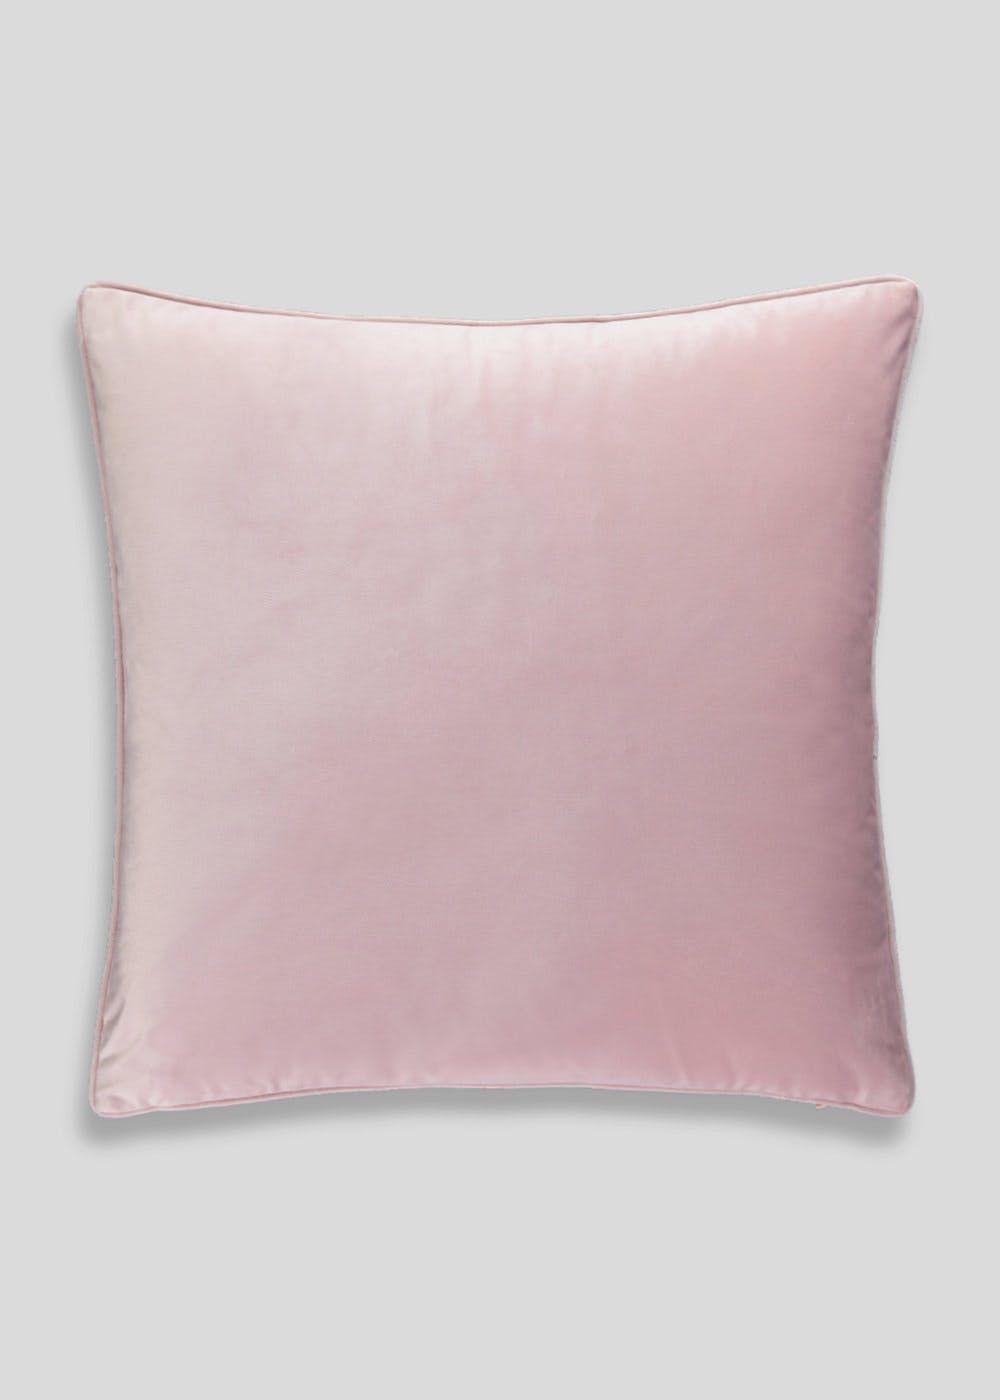 Large Matte Velvet Cushion 58cm X 58cm Pink In 2019 Friends